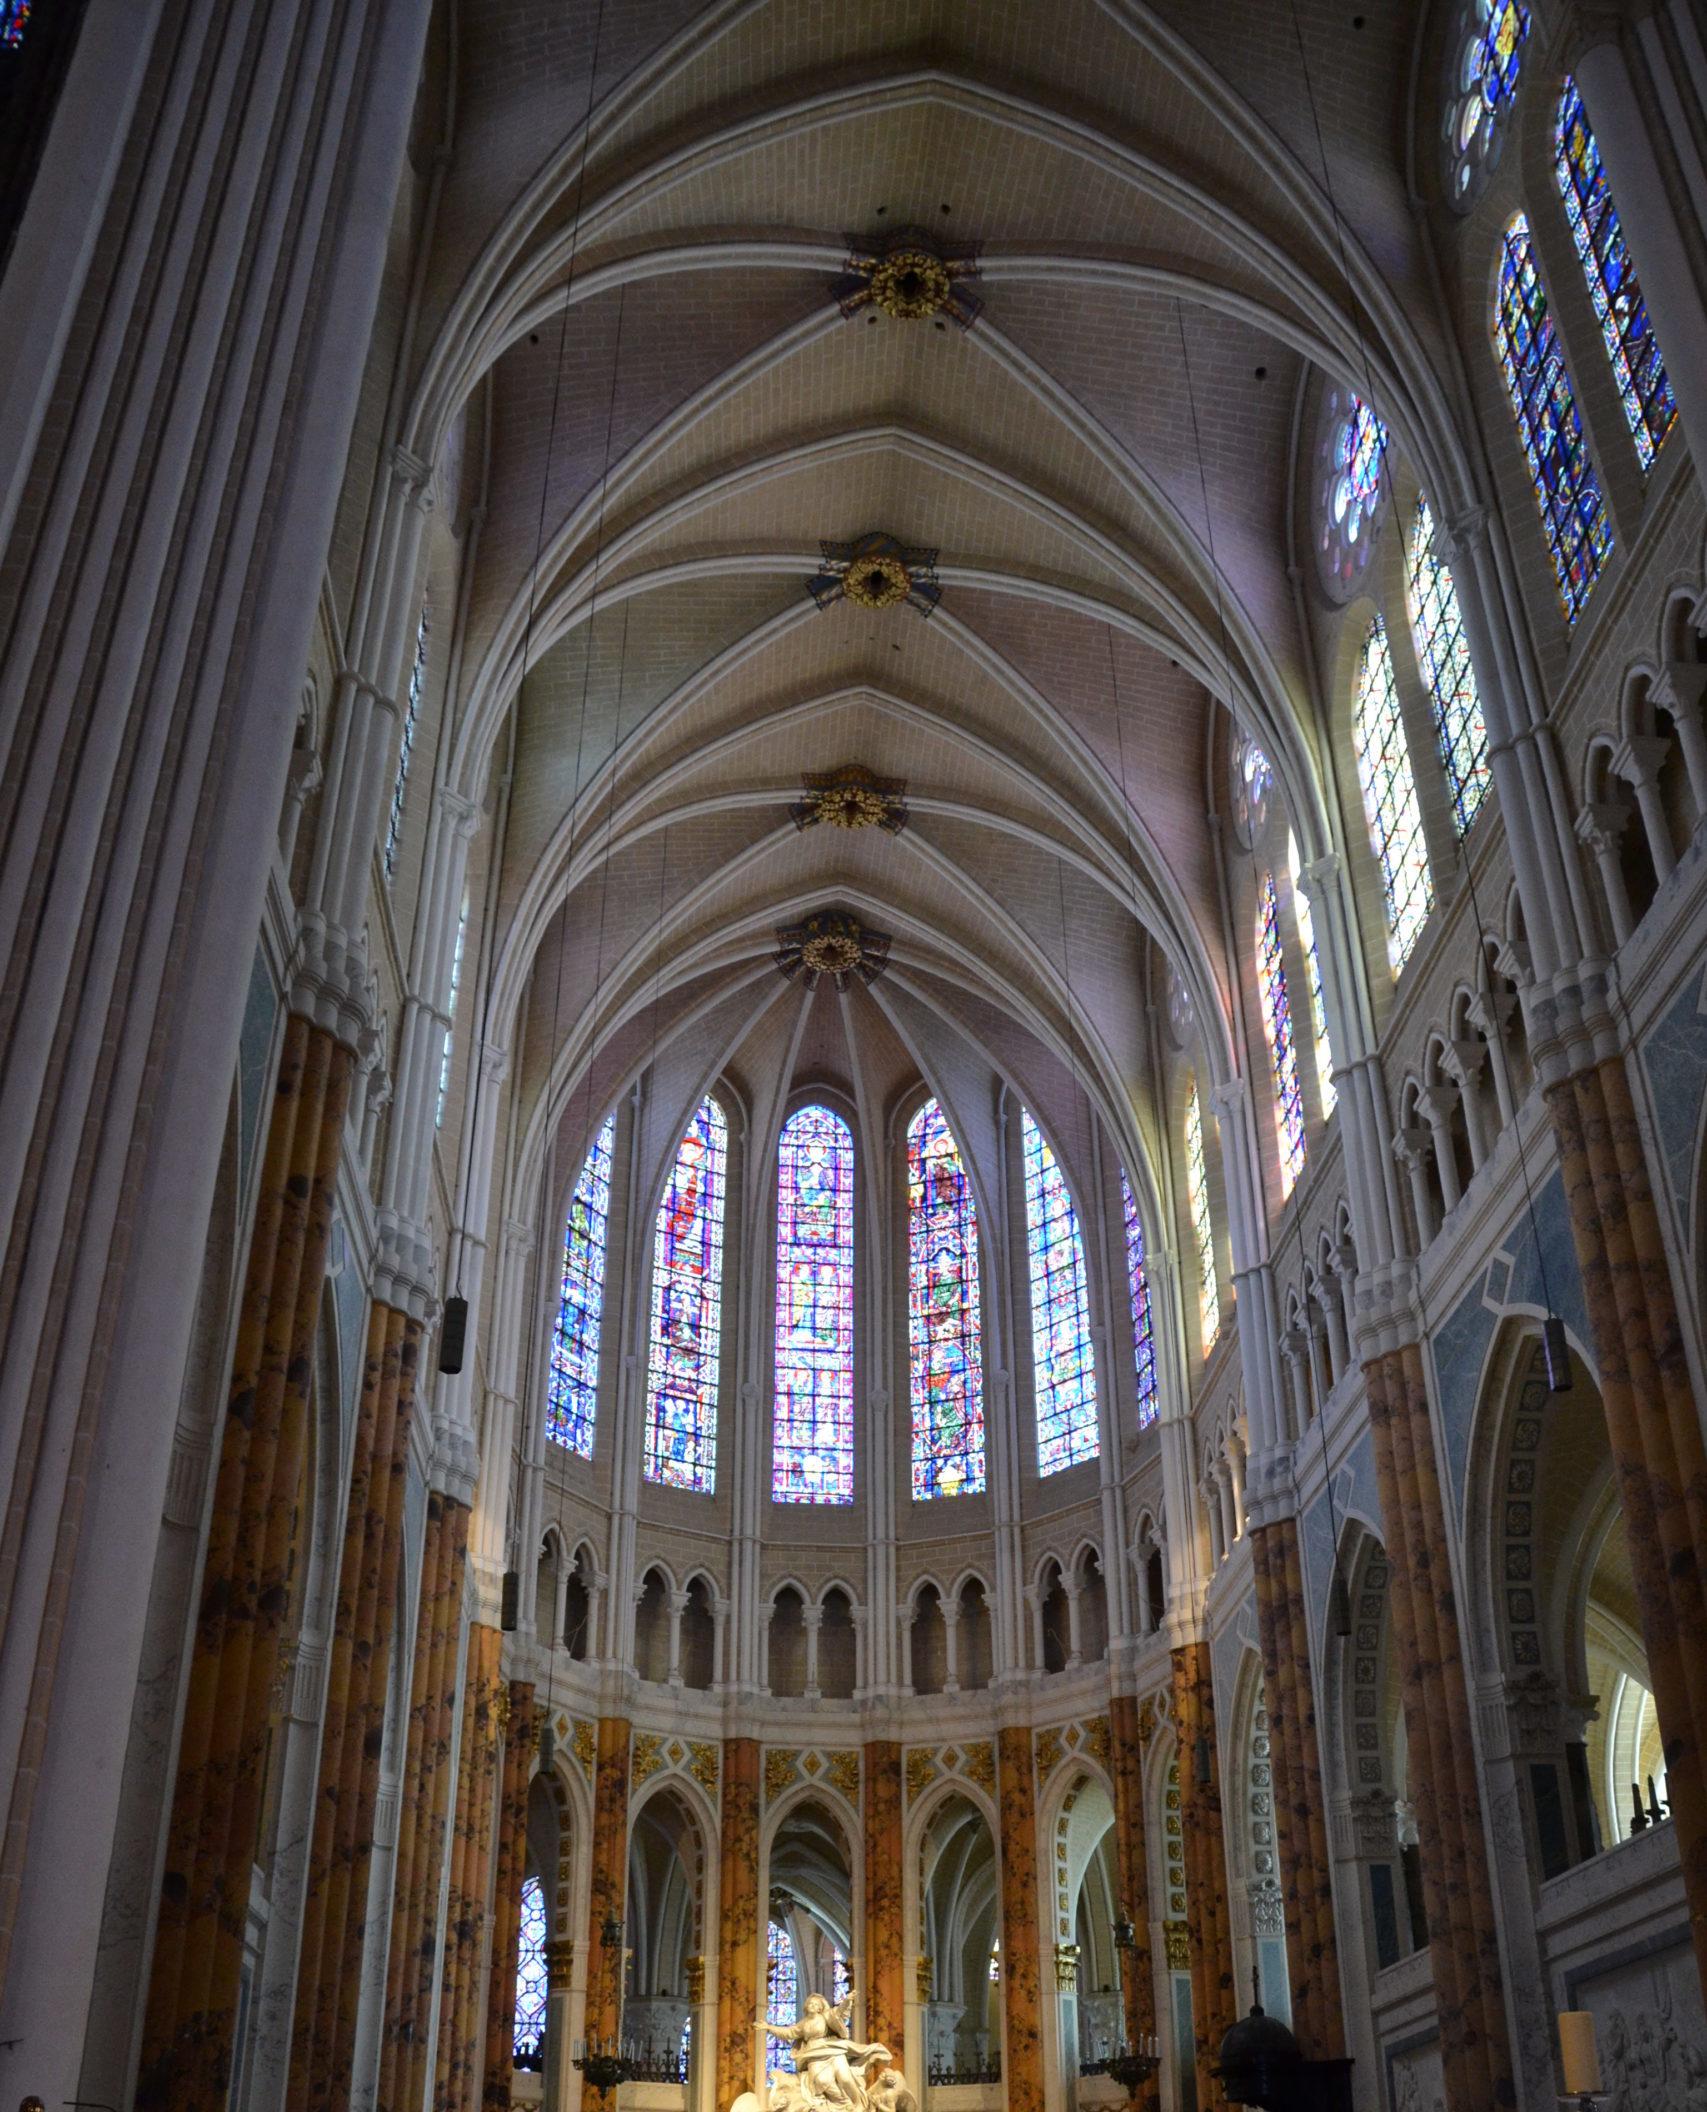 Krystal Cathedrals 1